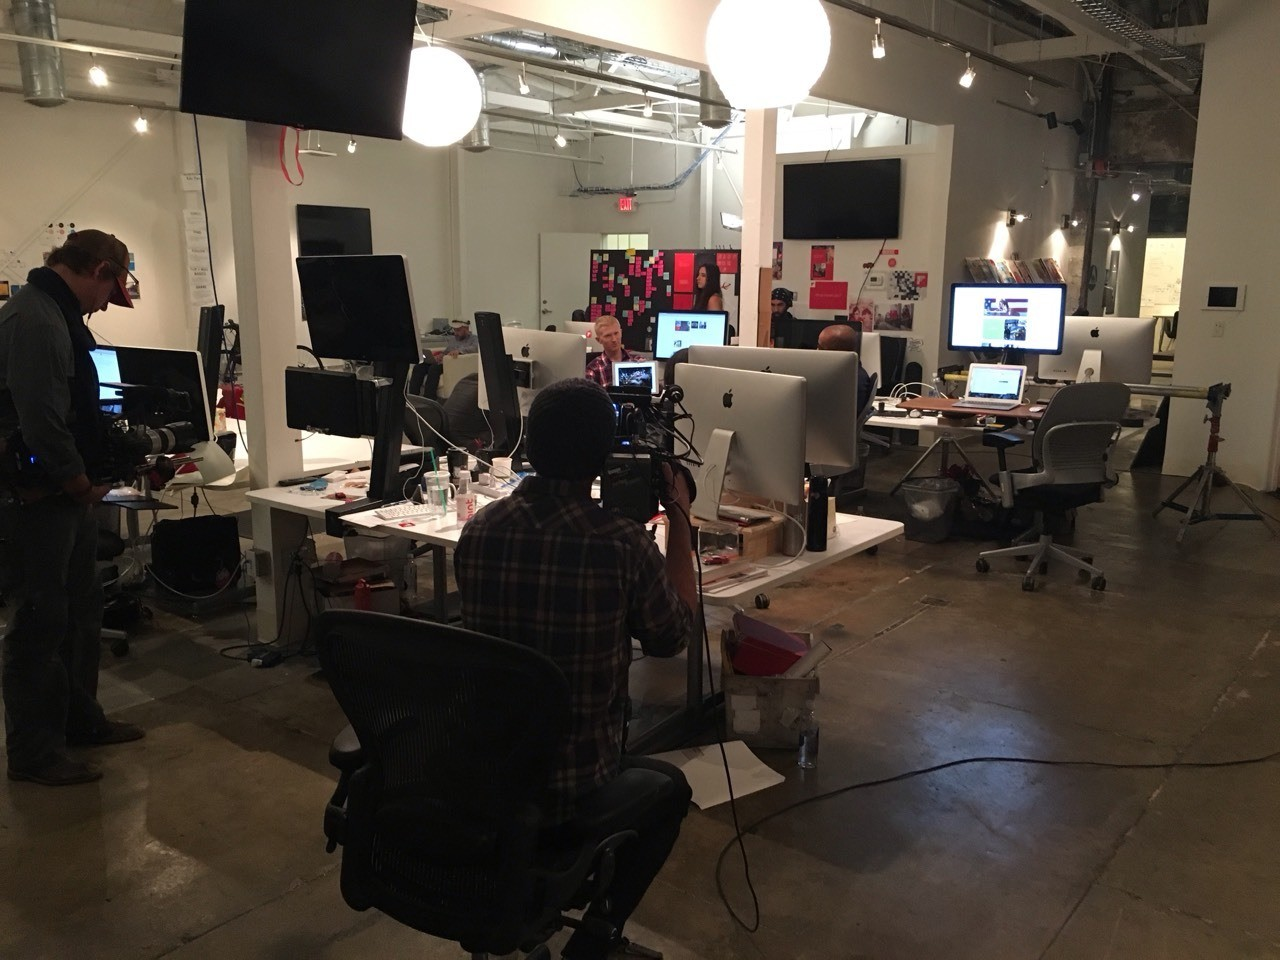 Behind the scenes in the Flipboard newsroom